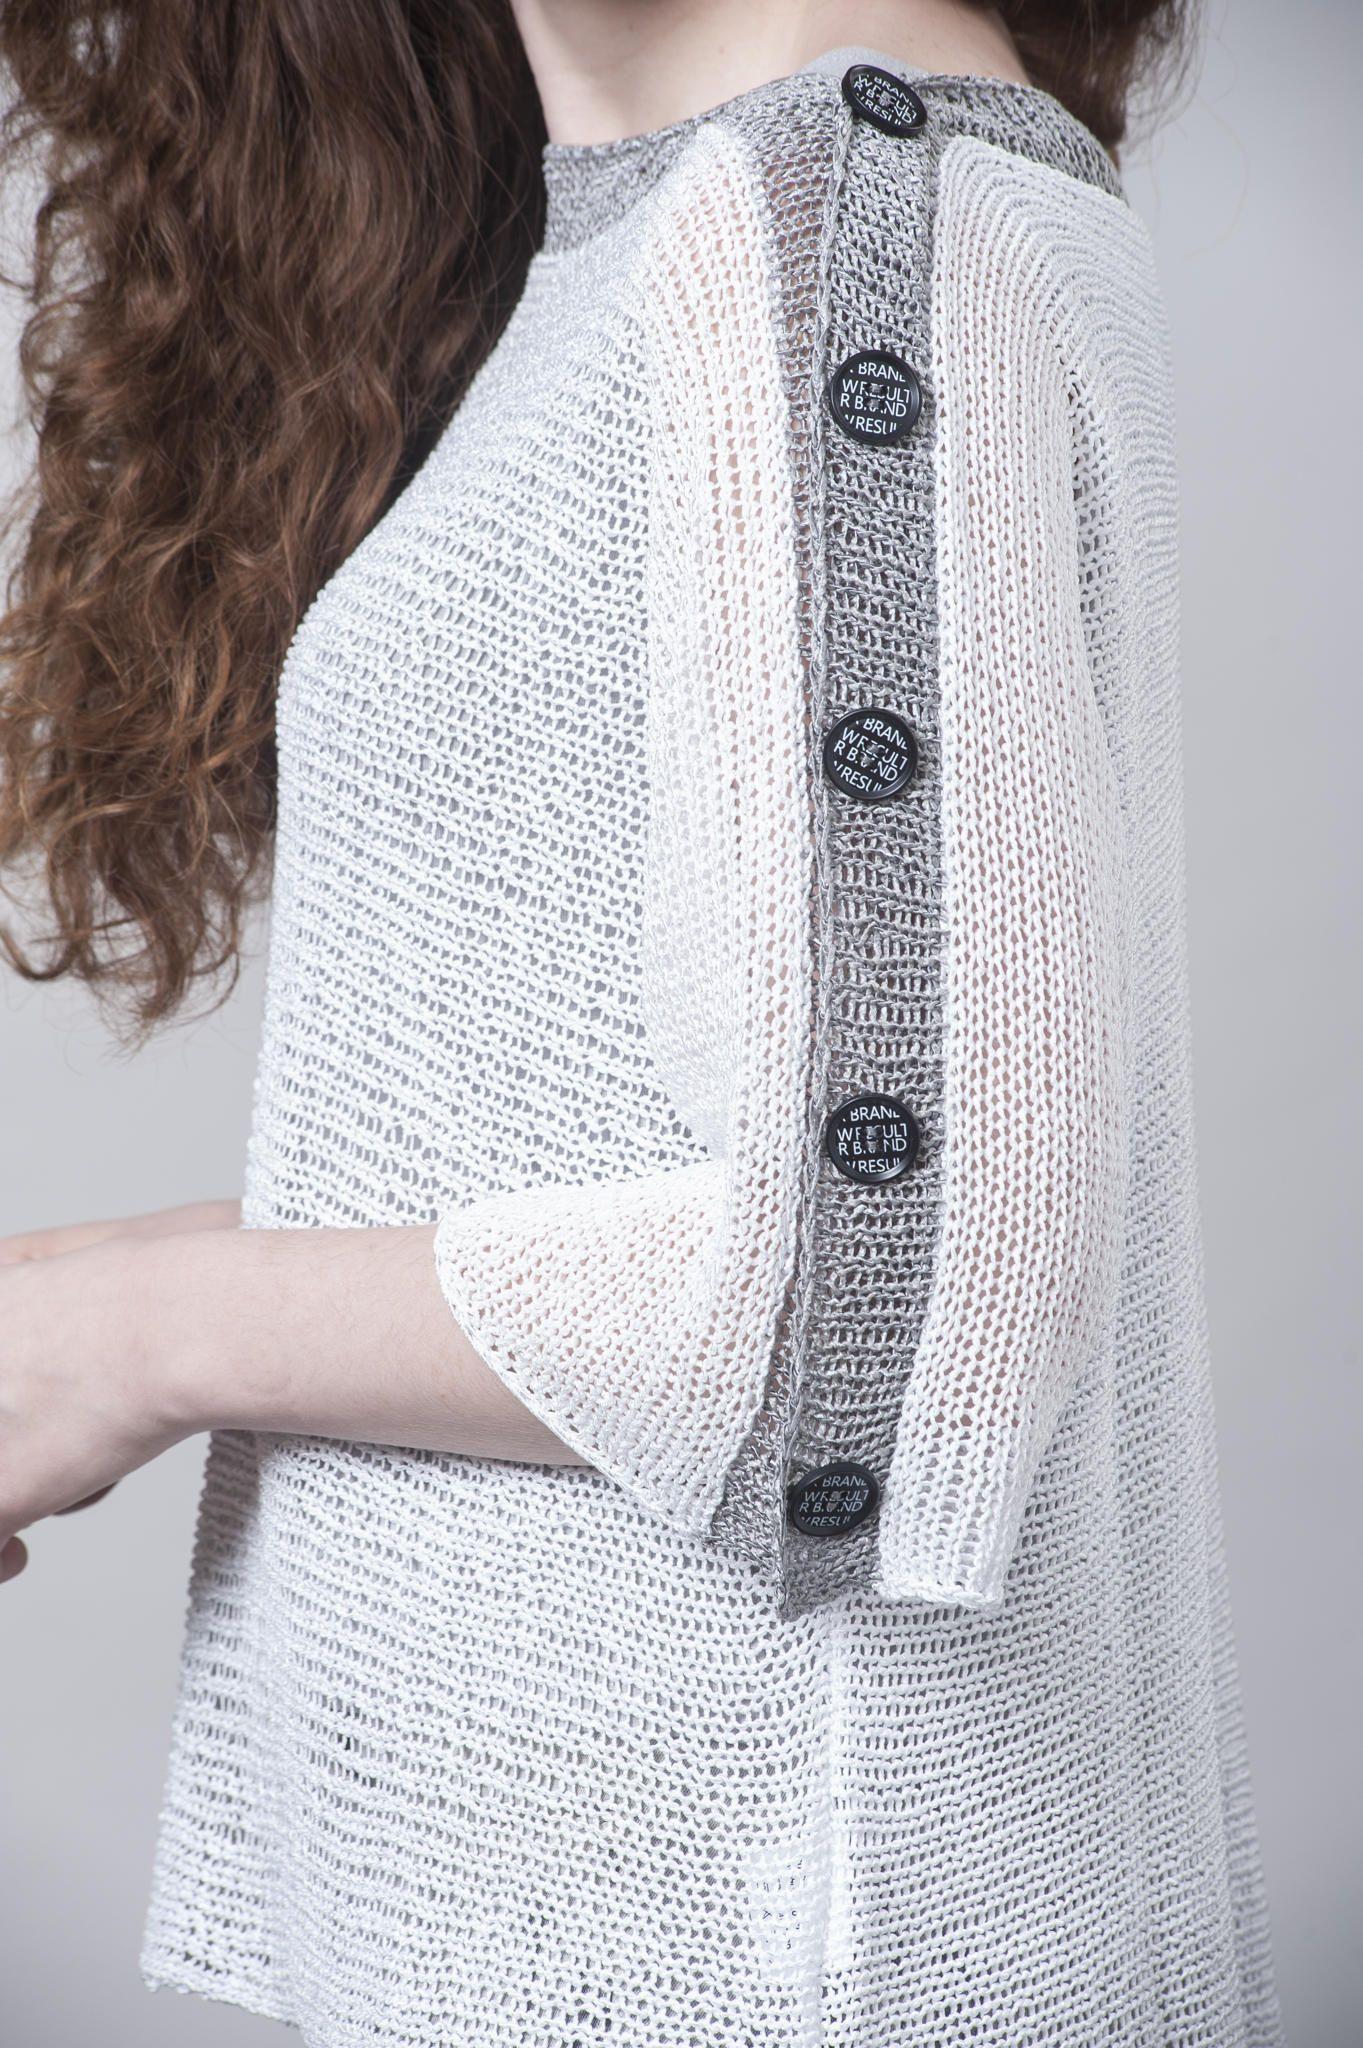 Crochet shirt as an exclusive wardrobe item 50